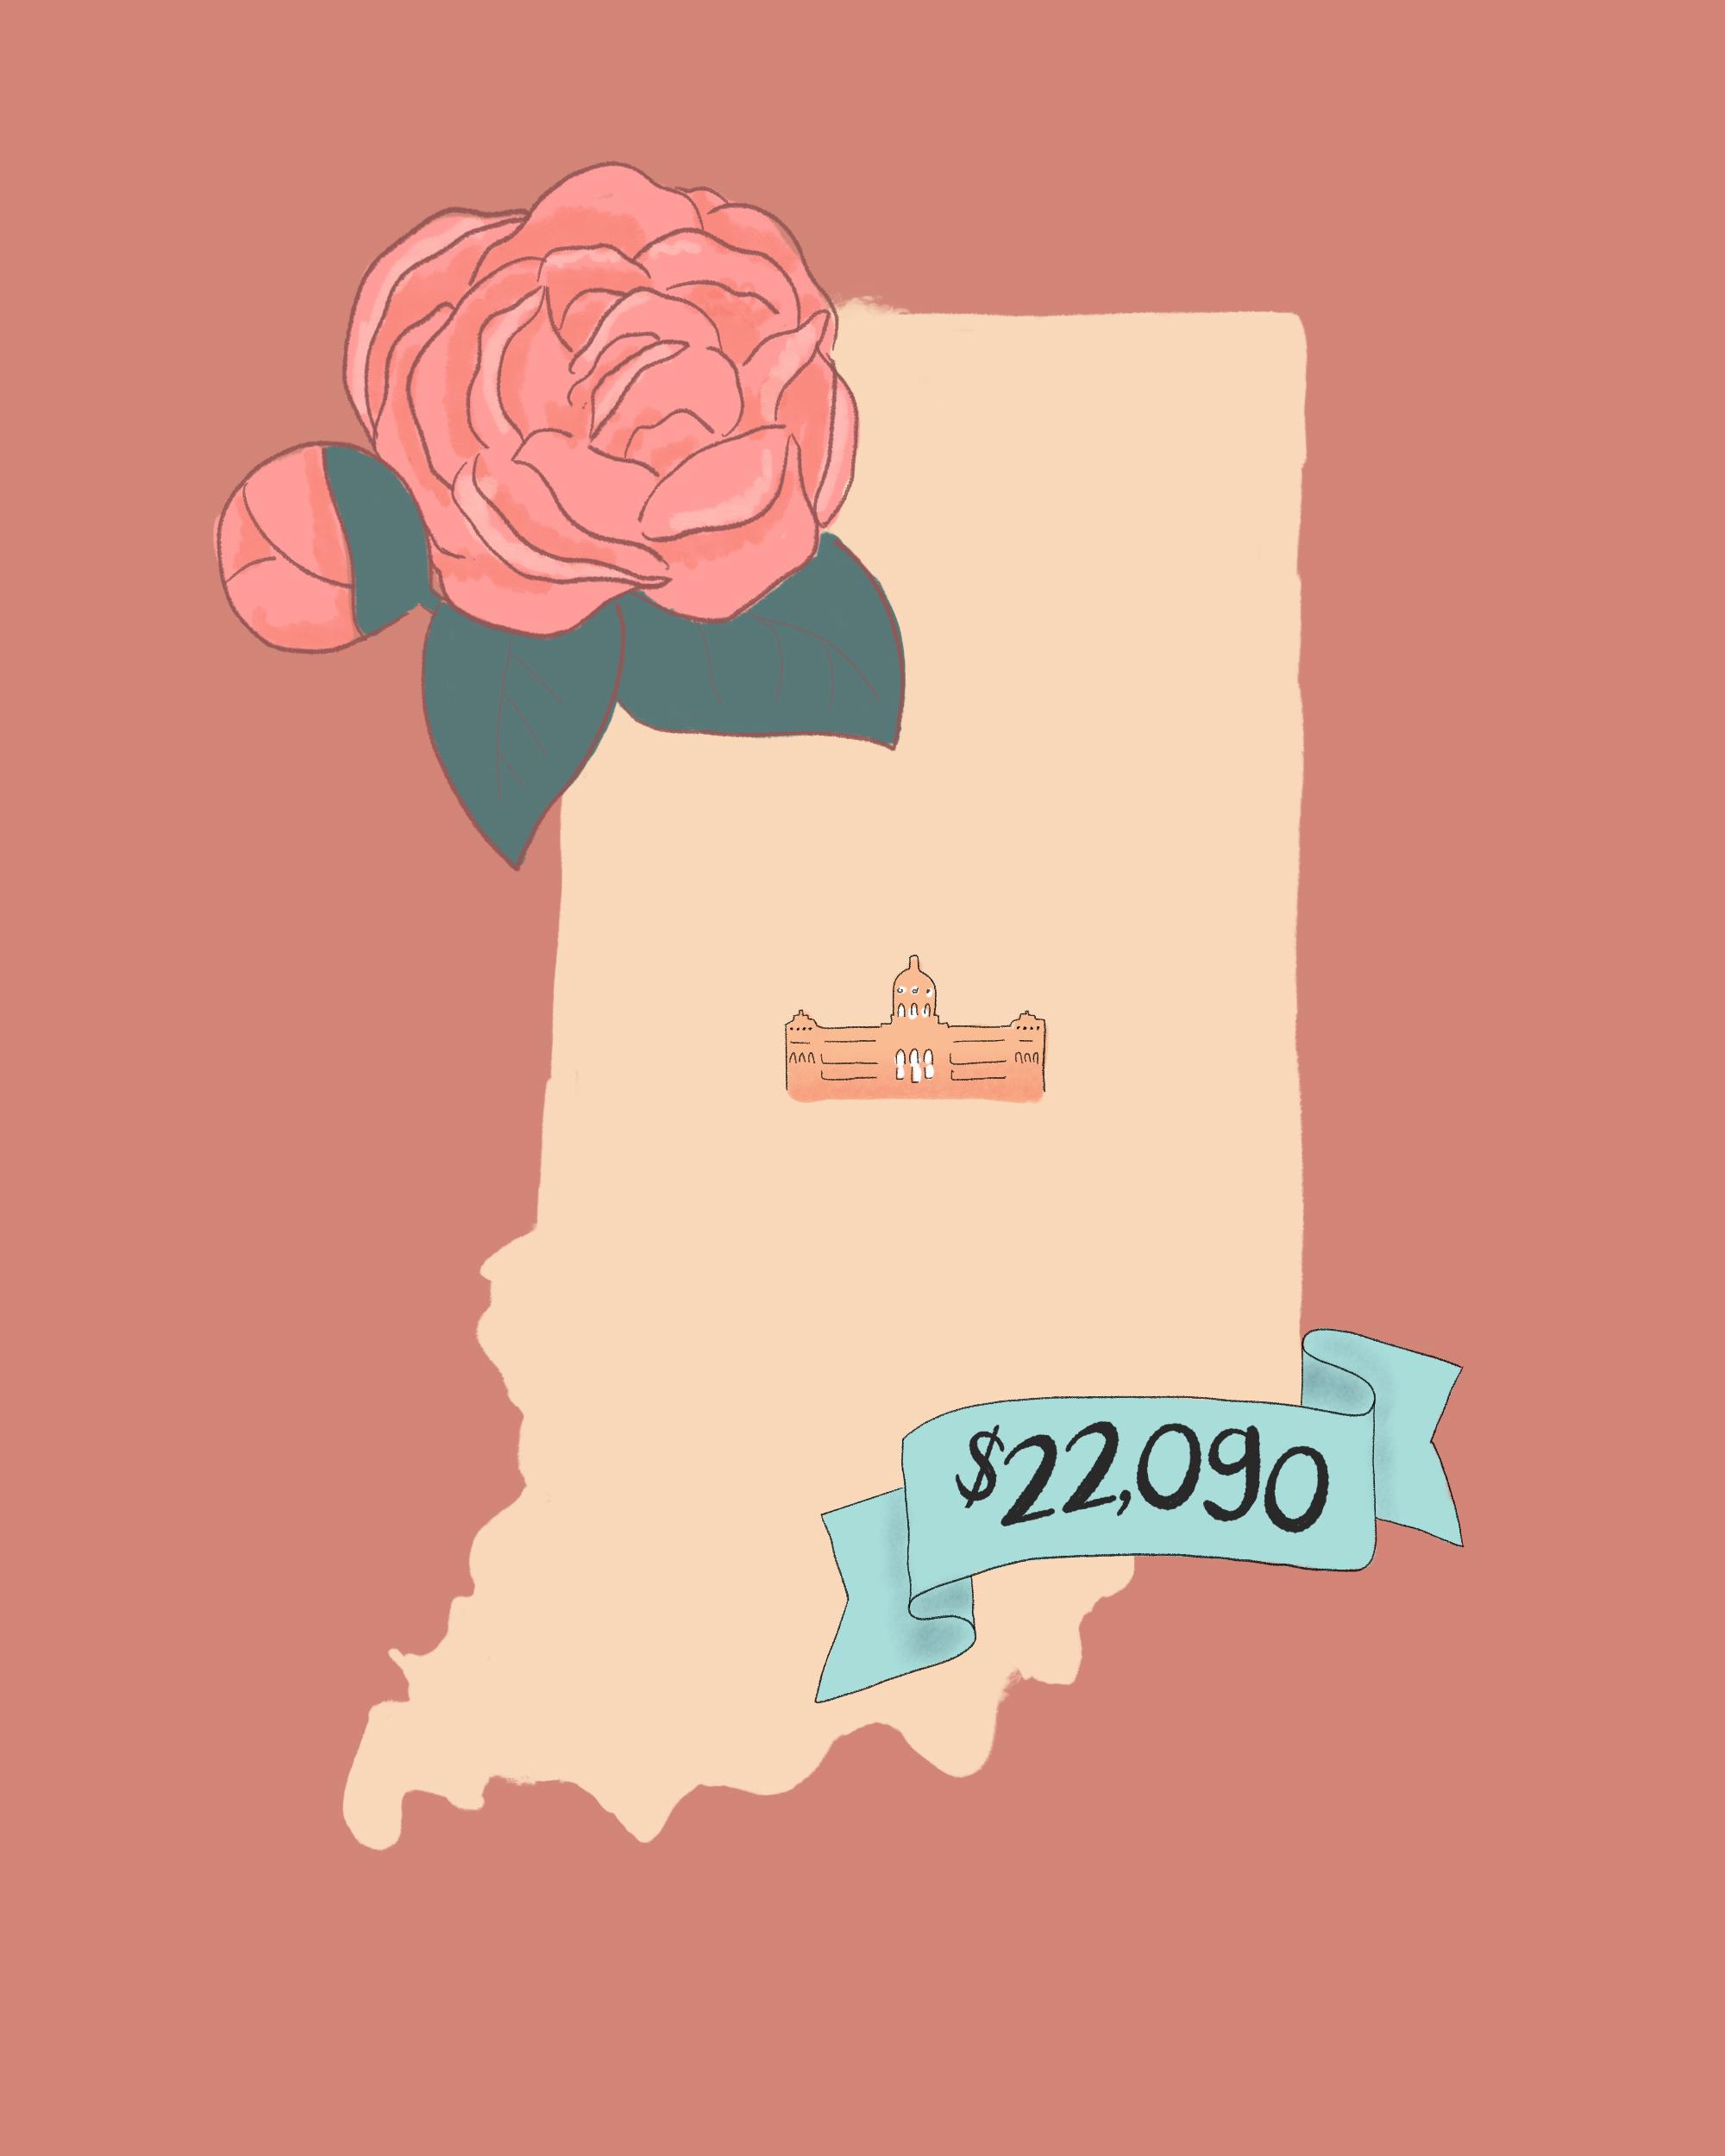 state wedding costs illustration indiana